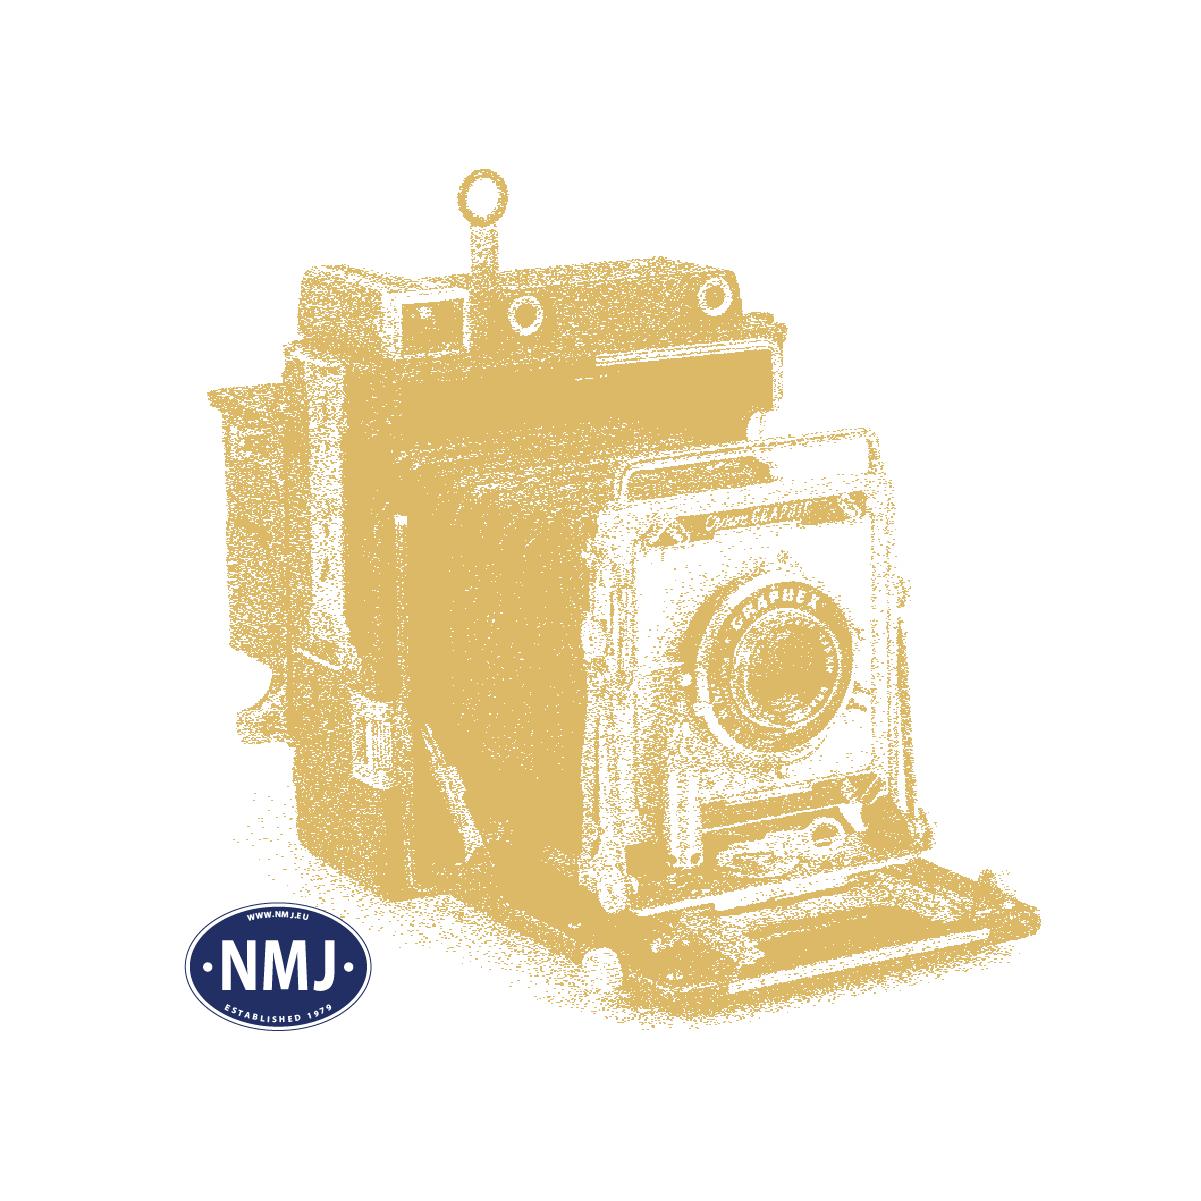 NMJT90604 - NMJ Topline CLR V170 1151, DCC m/ Lyd